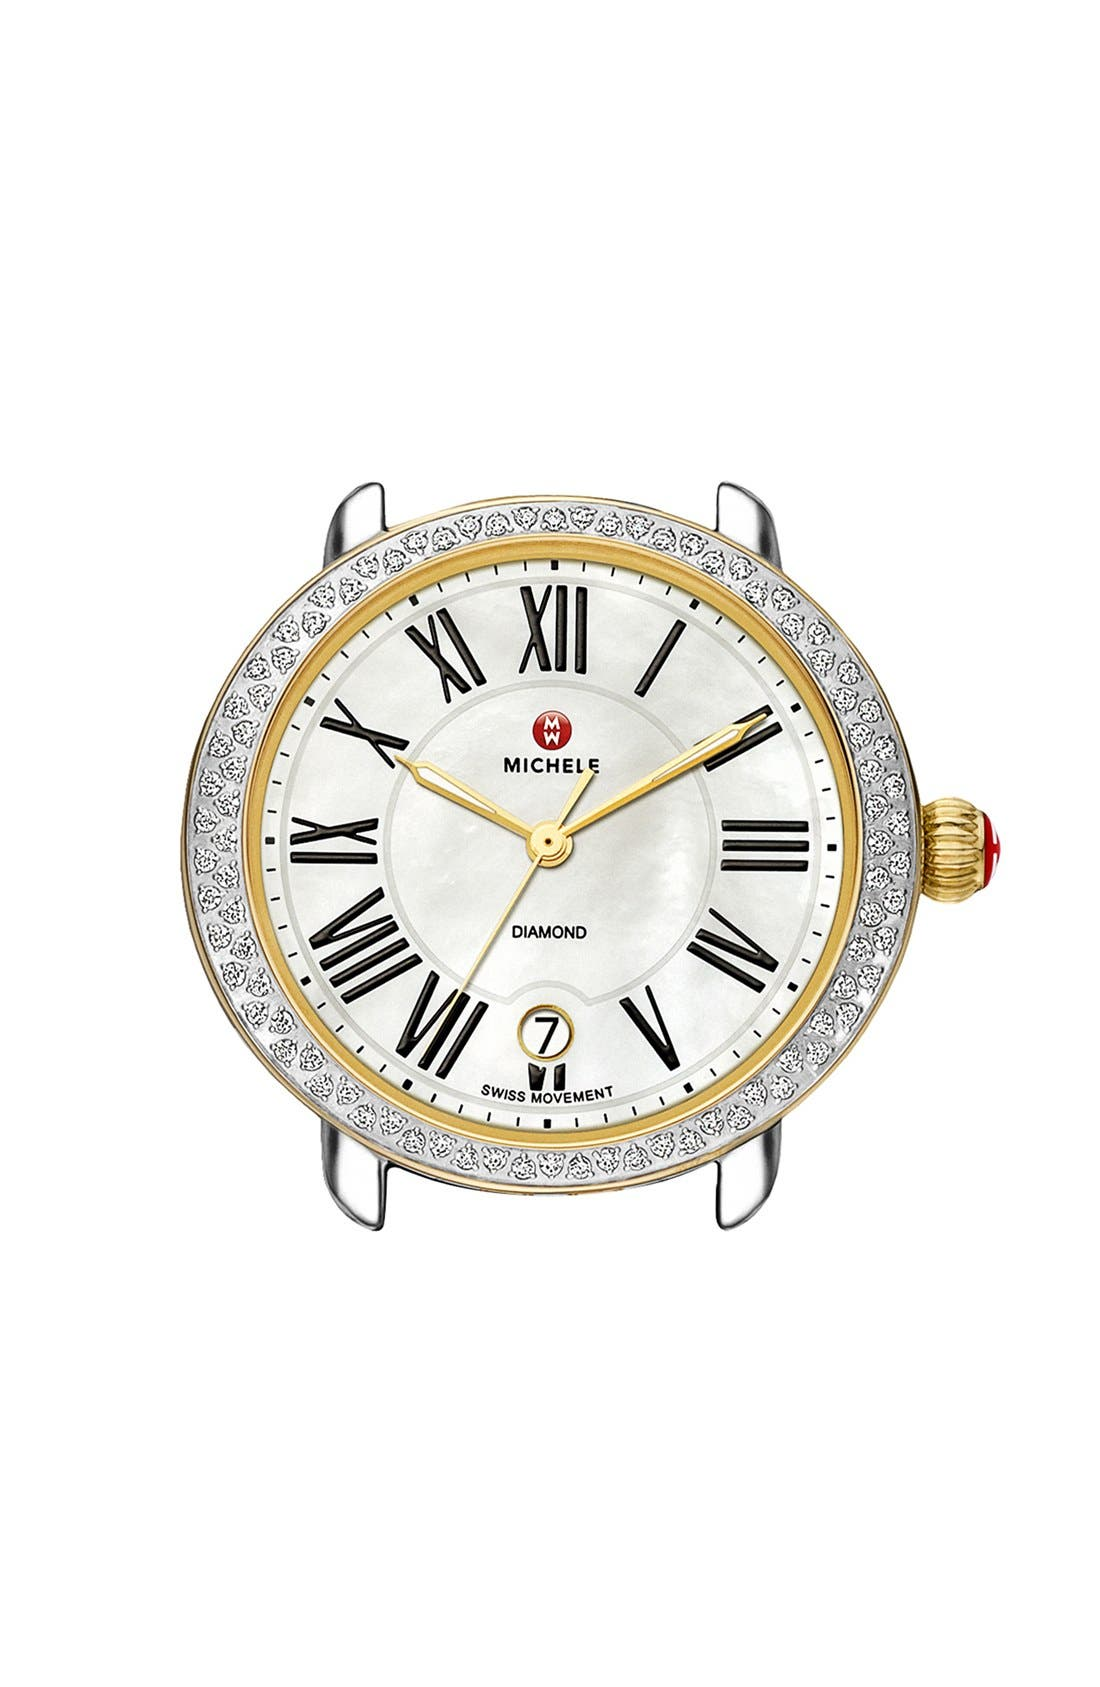 Alternate Image 1 Selected - MICHELE Serein 16 Diamond Watch Case, 34mm x 36mm